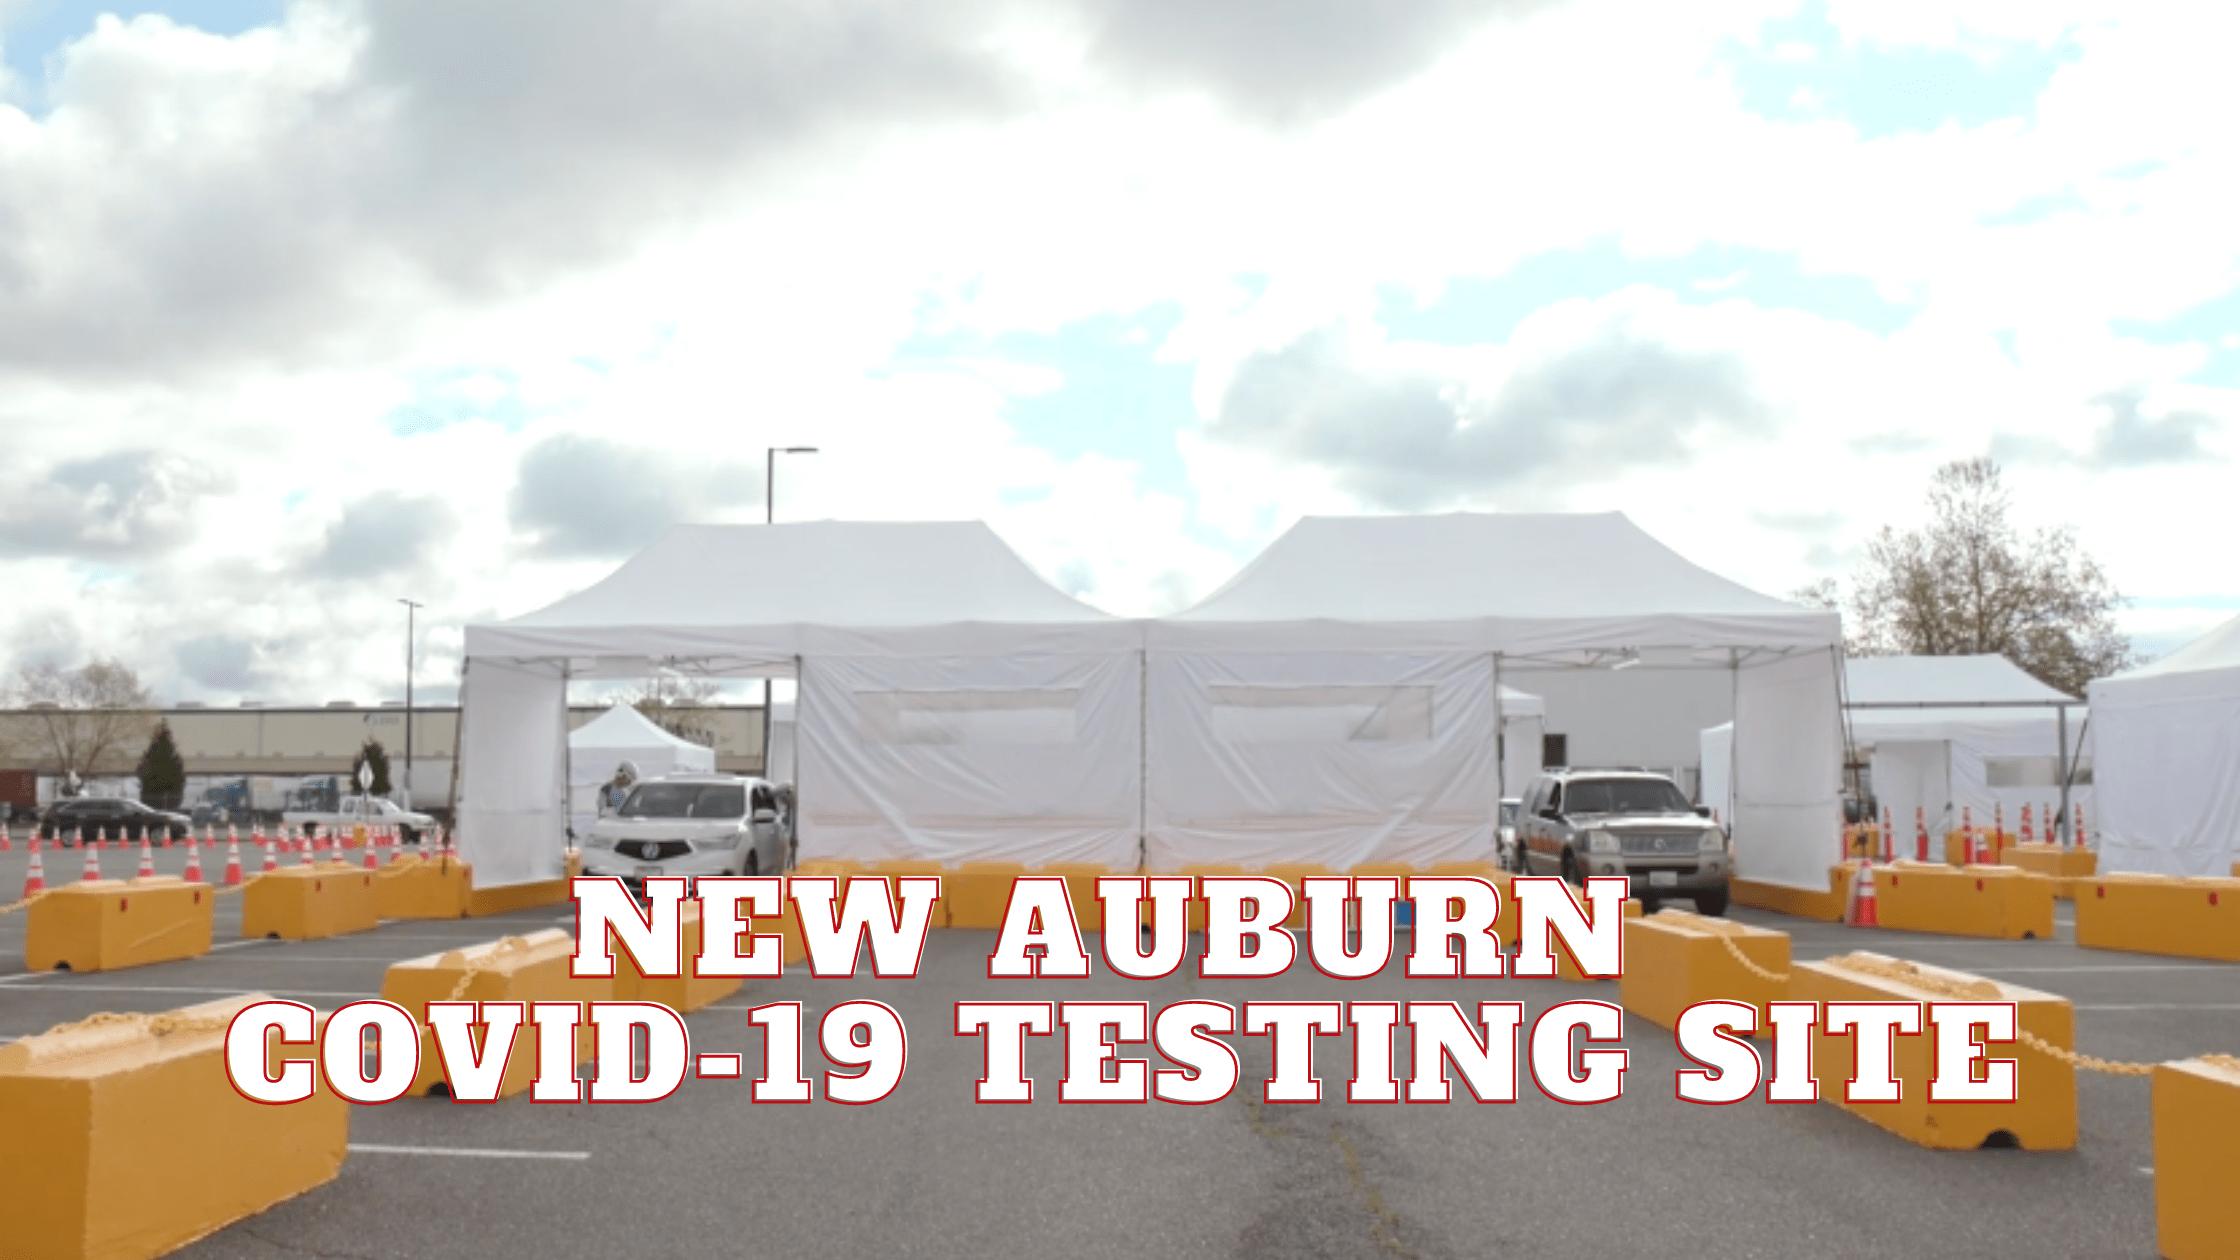 new-auburn-covid-19-testing-site